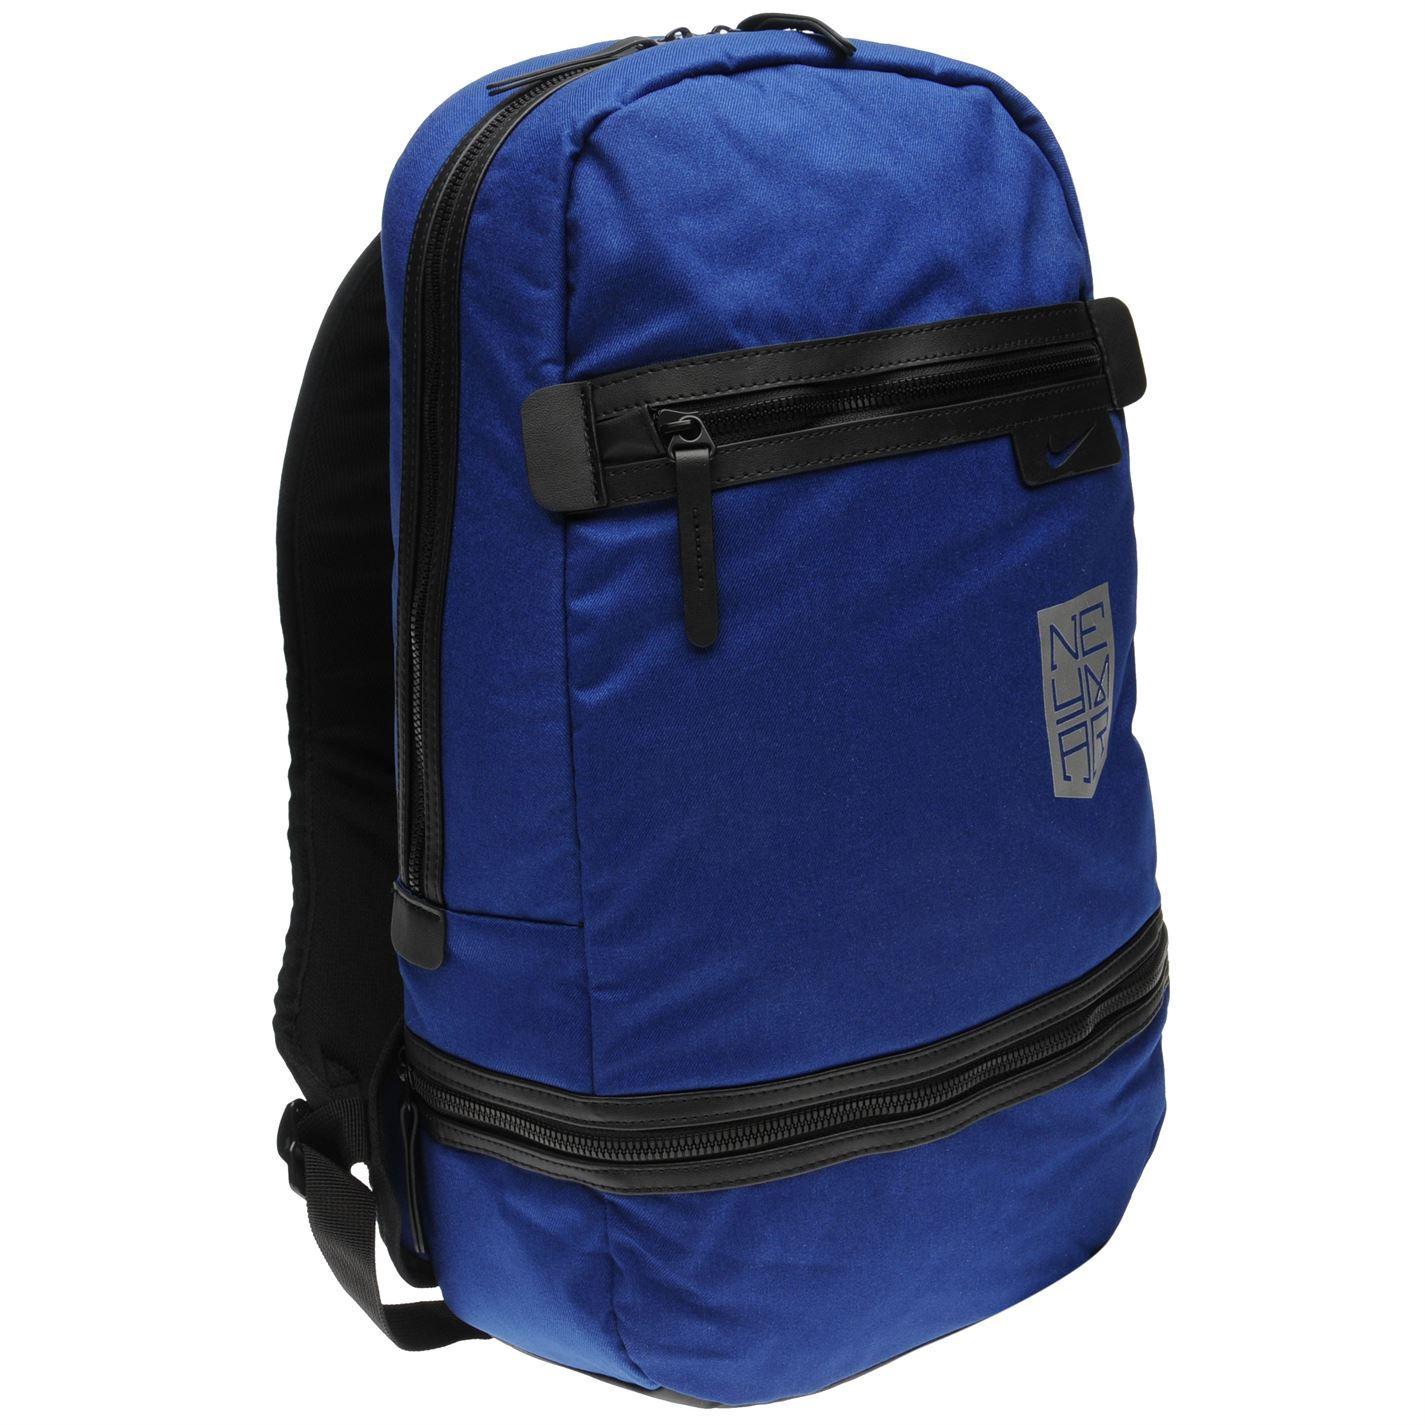 ... Nike Neymar Backpack Royal Blue Sports Gym Bag Rucksack Carryall ... 812db42a944b